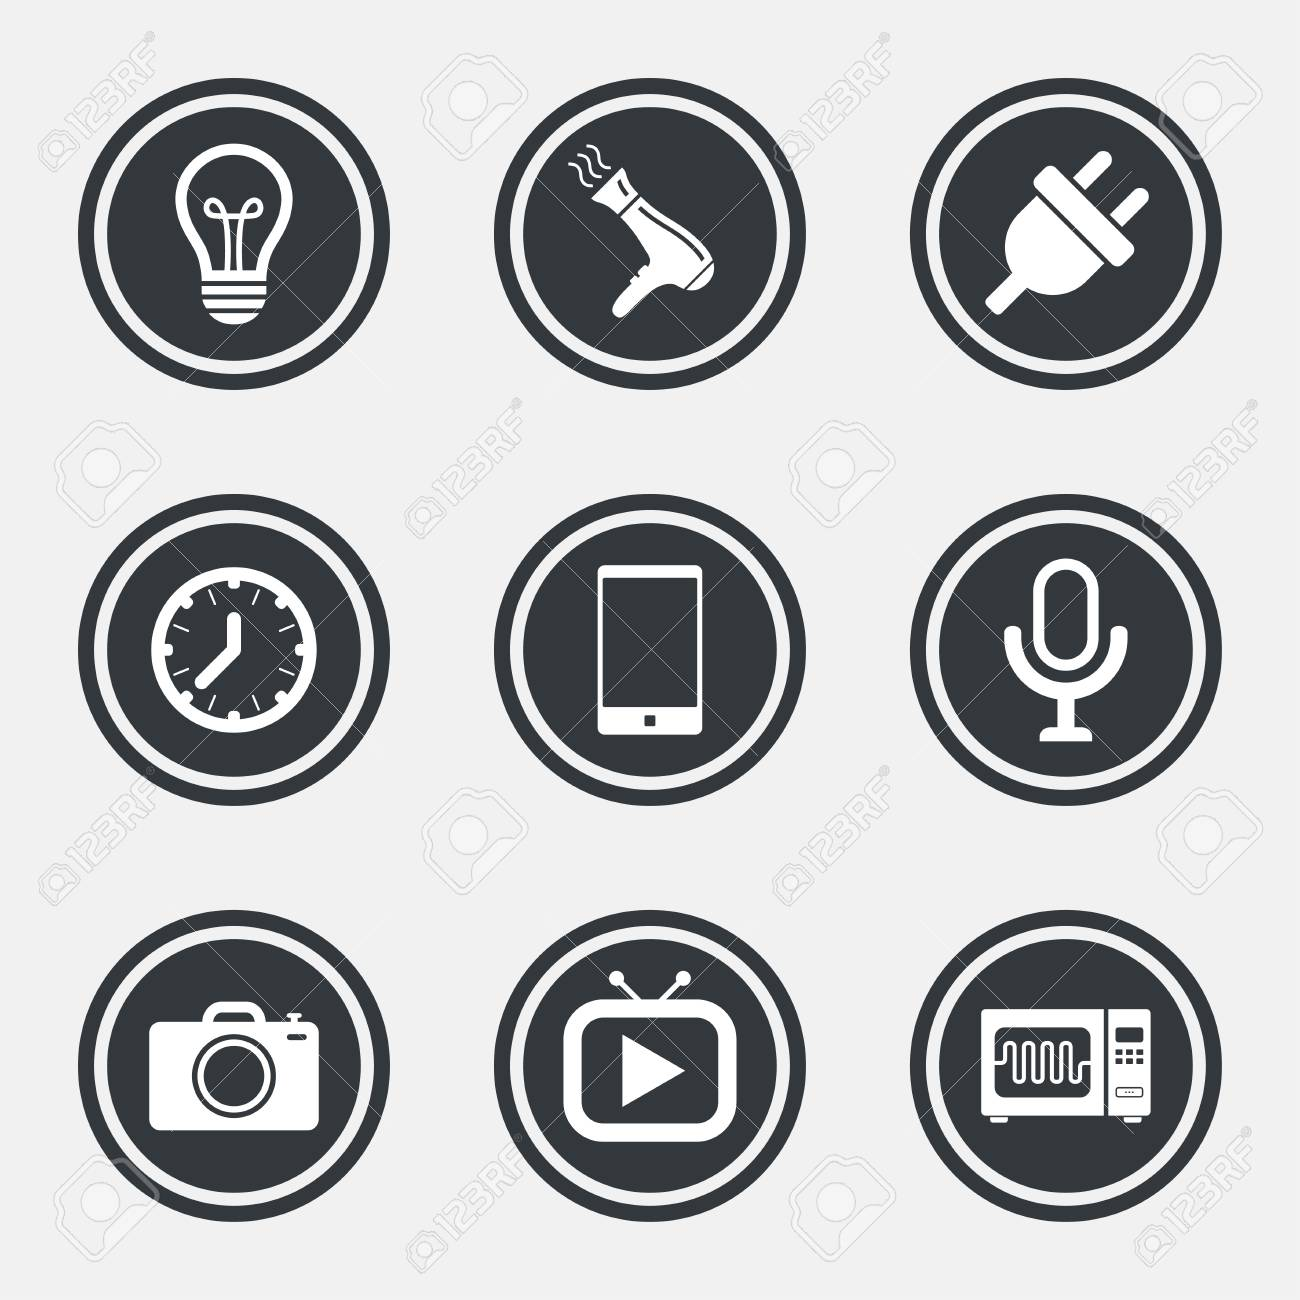 Ziemlich Symbole Elektronik Fotos - Verdrahtungsideen - korsmi.info